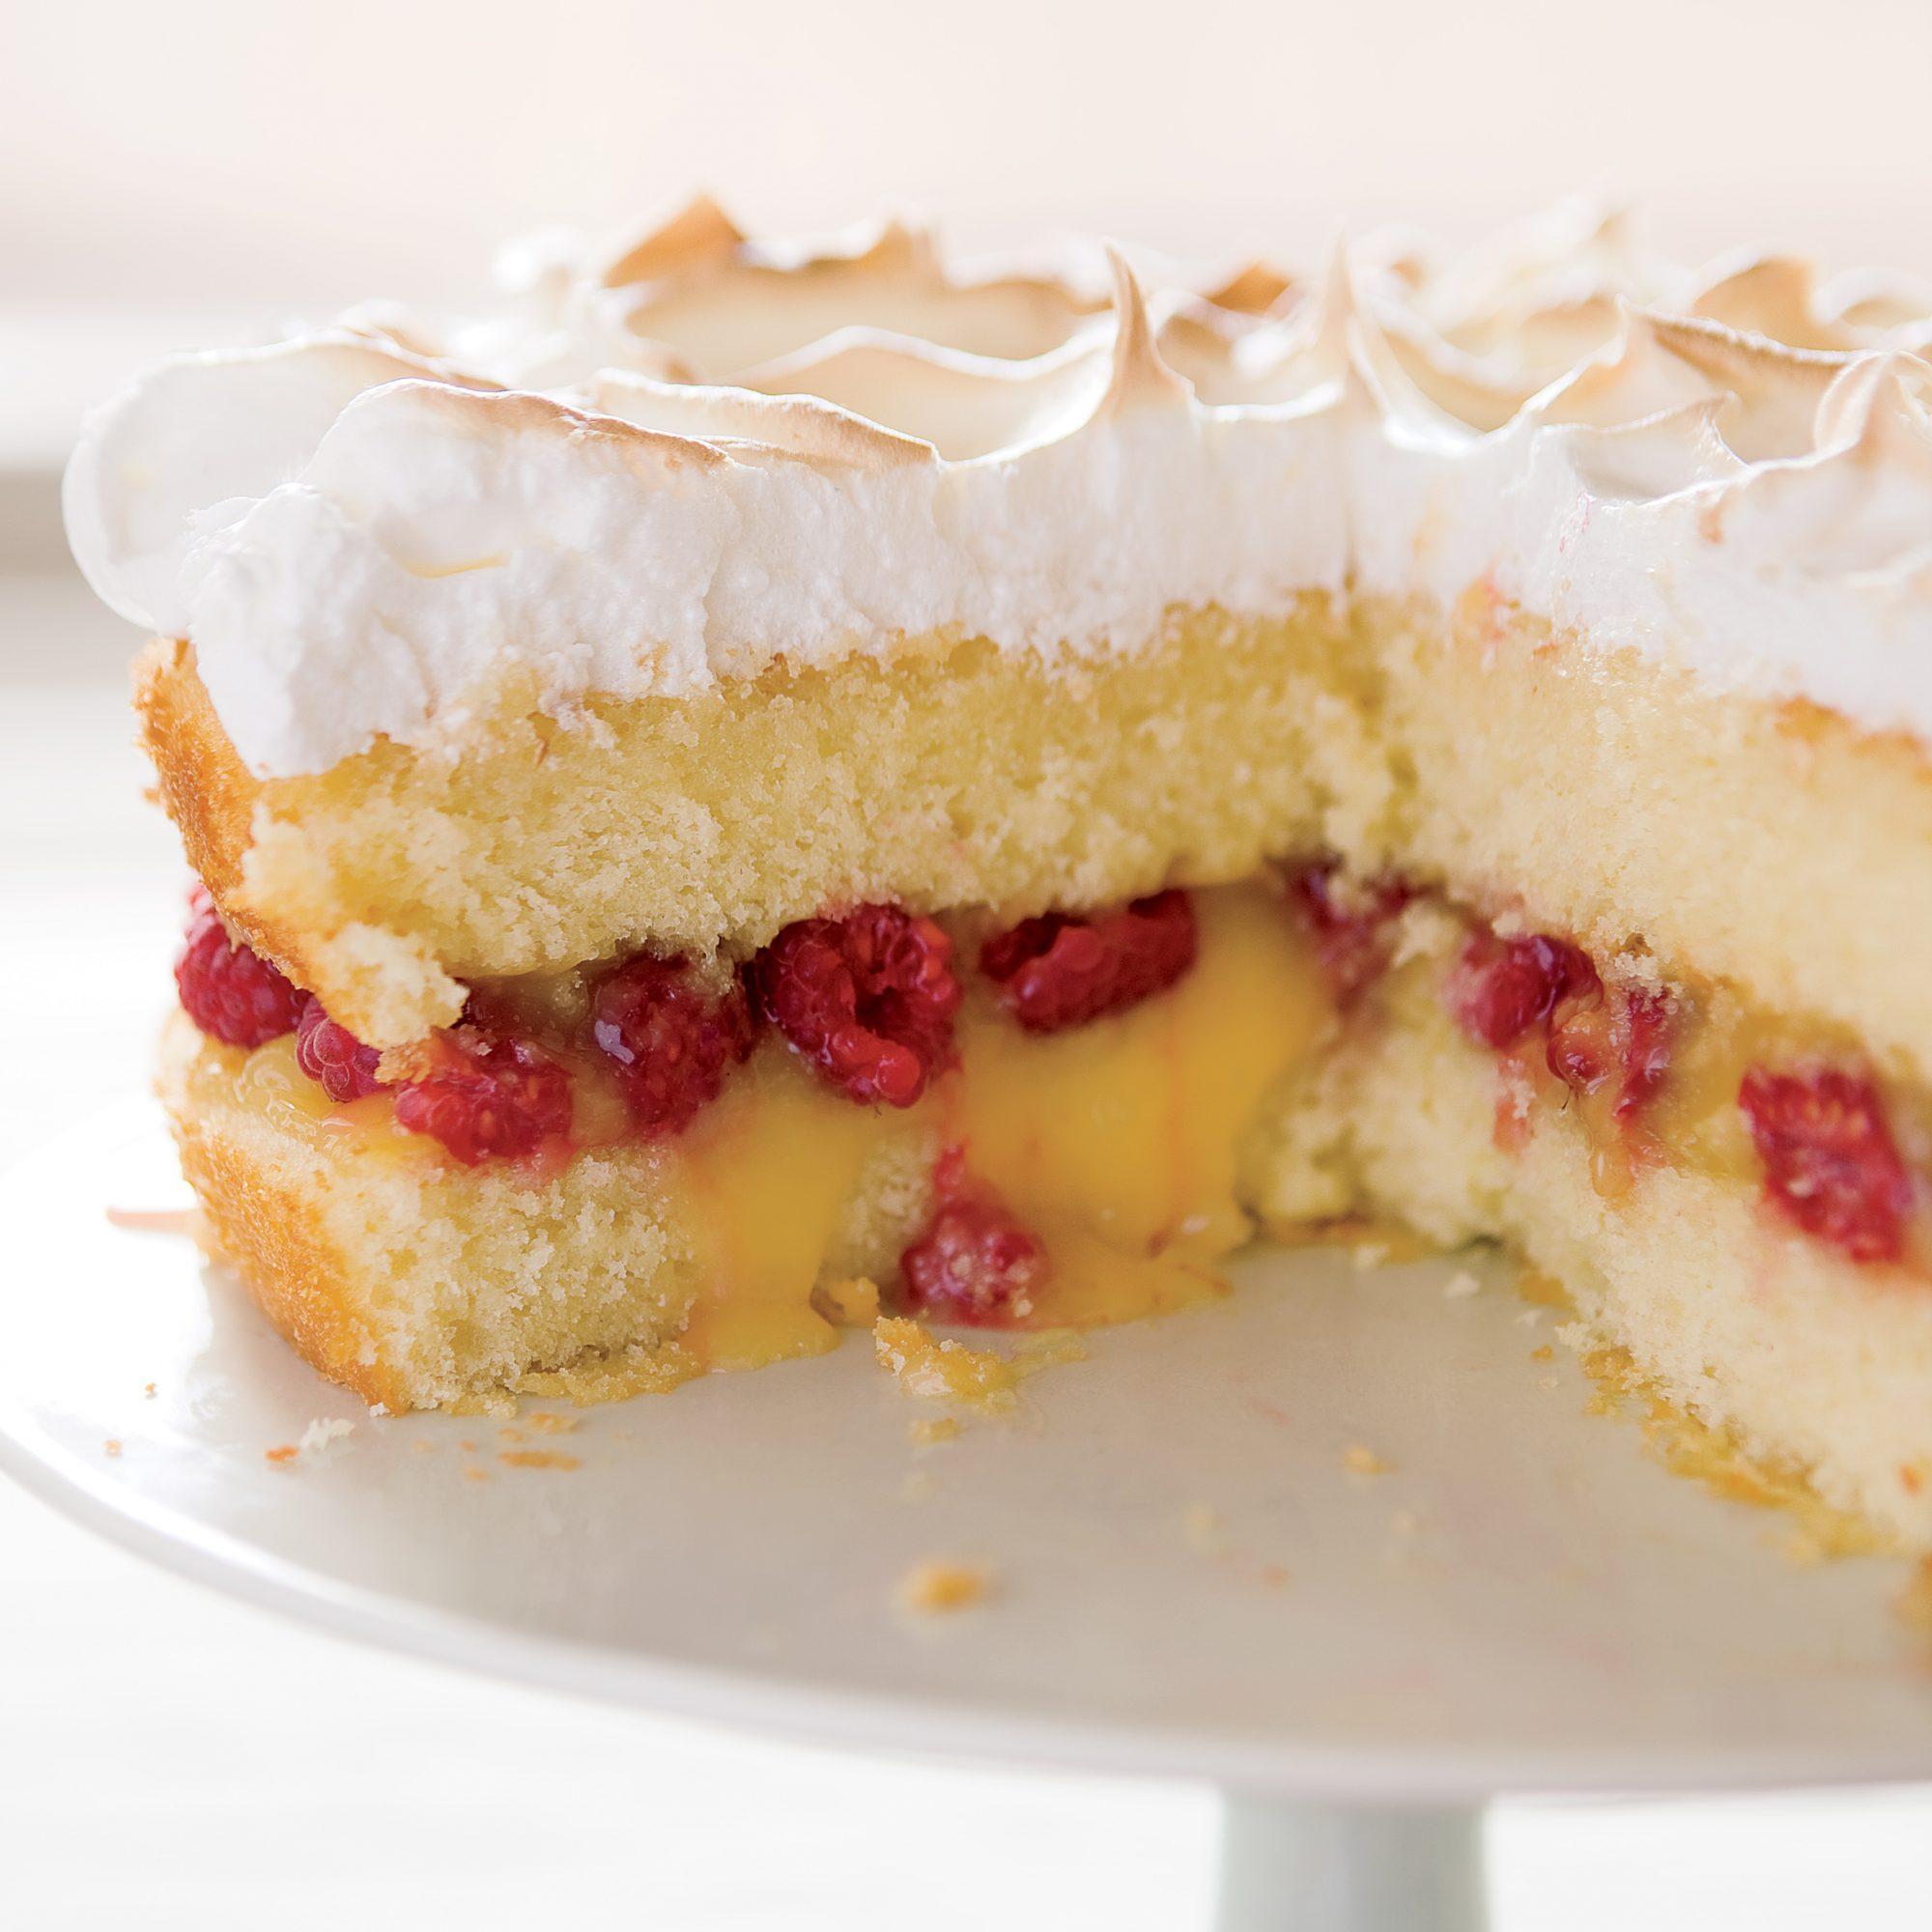 Raspberry-Lemon Meringue Cake